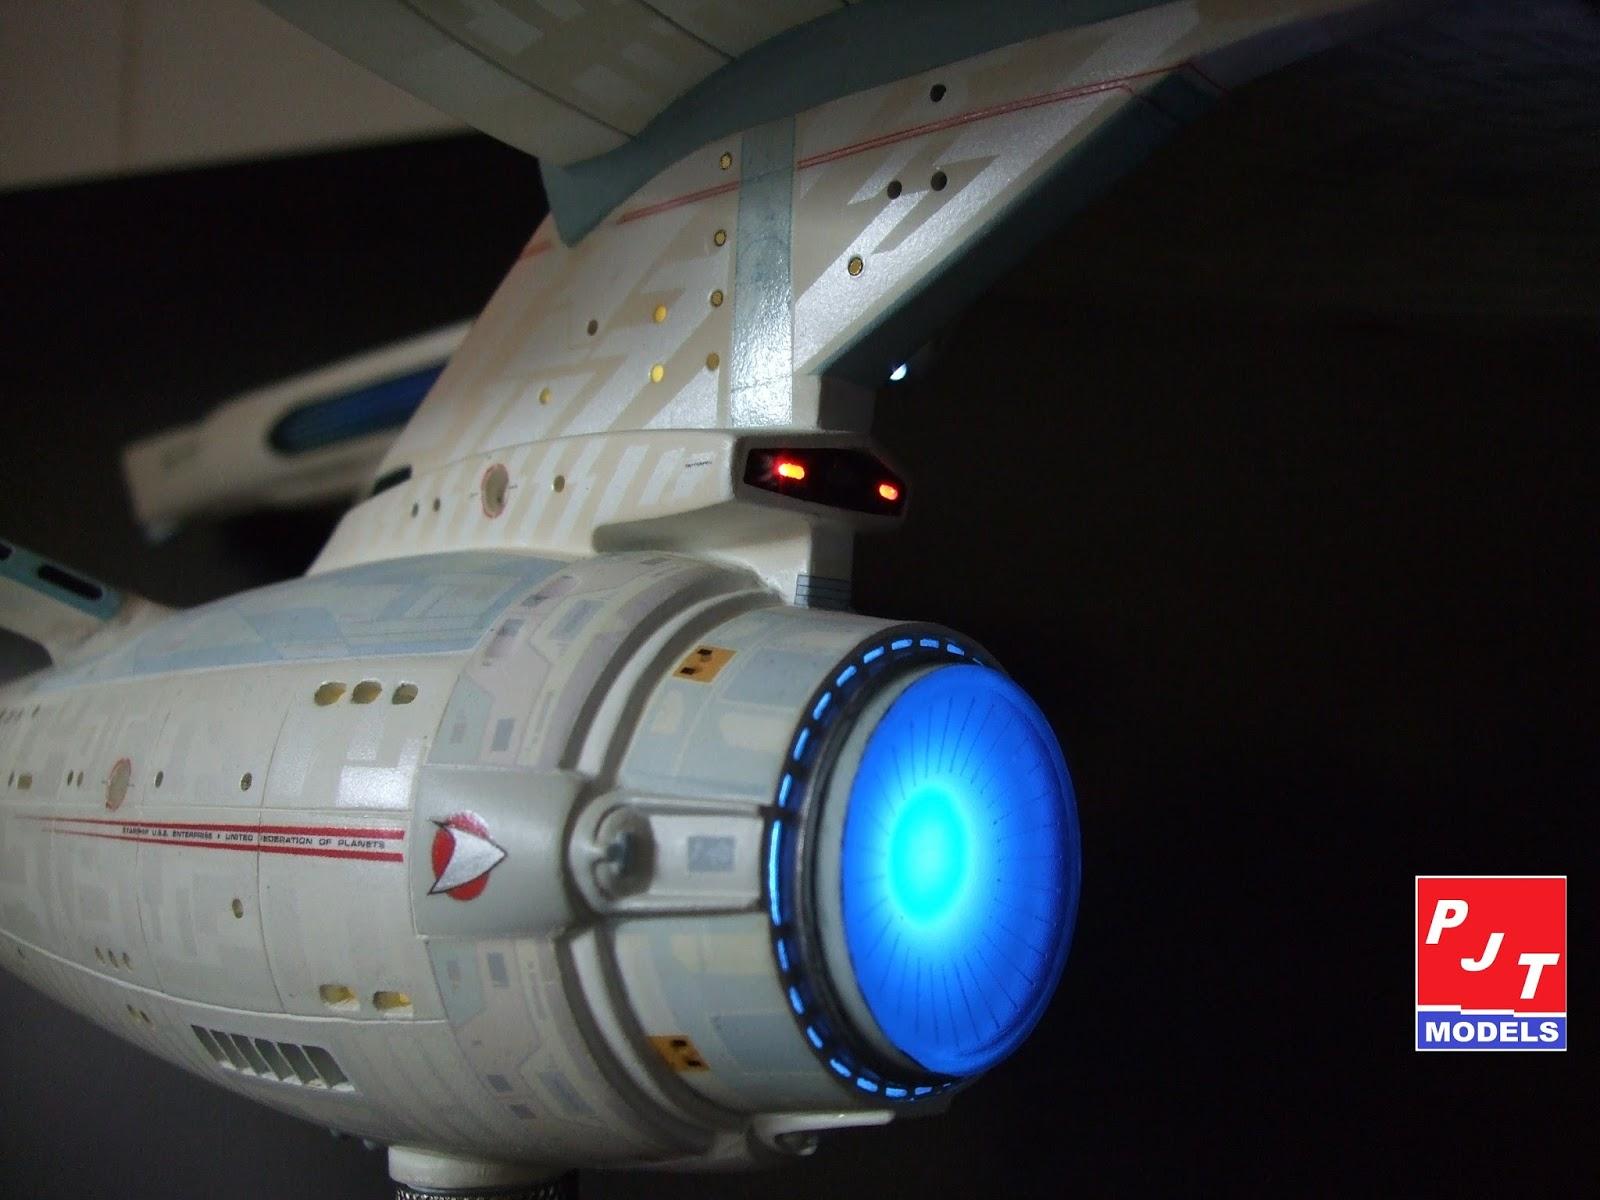 Star trek uss enterprise ncc refit 1 scale model - Amt Ertl 1 537 Star Trek U S S Enterprise Refit Ncc 1701 A